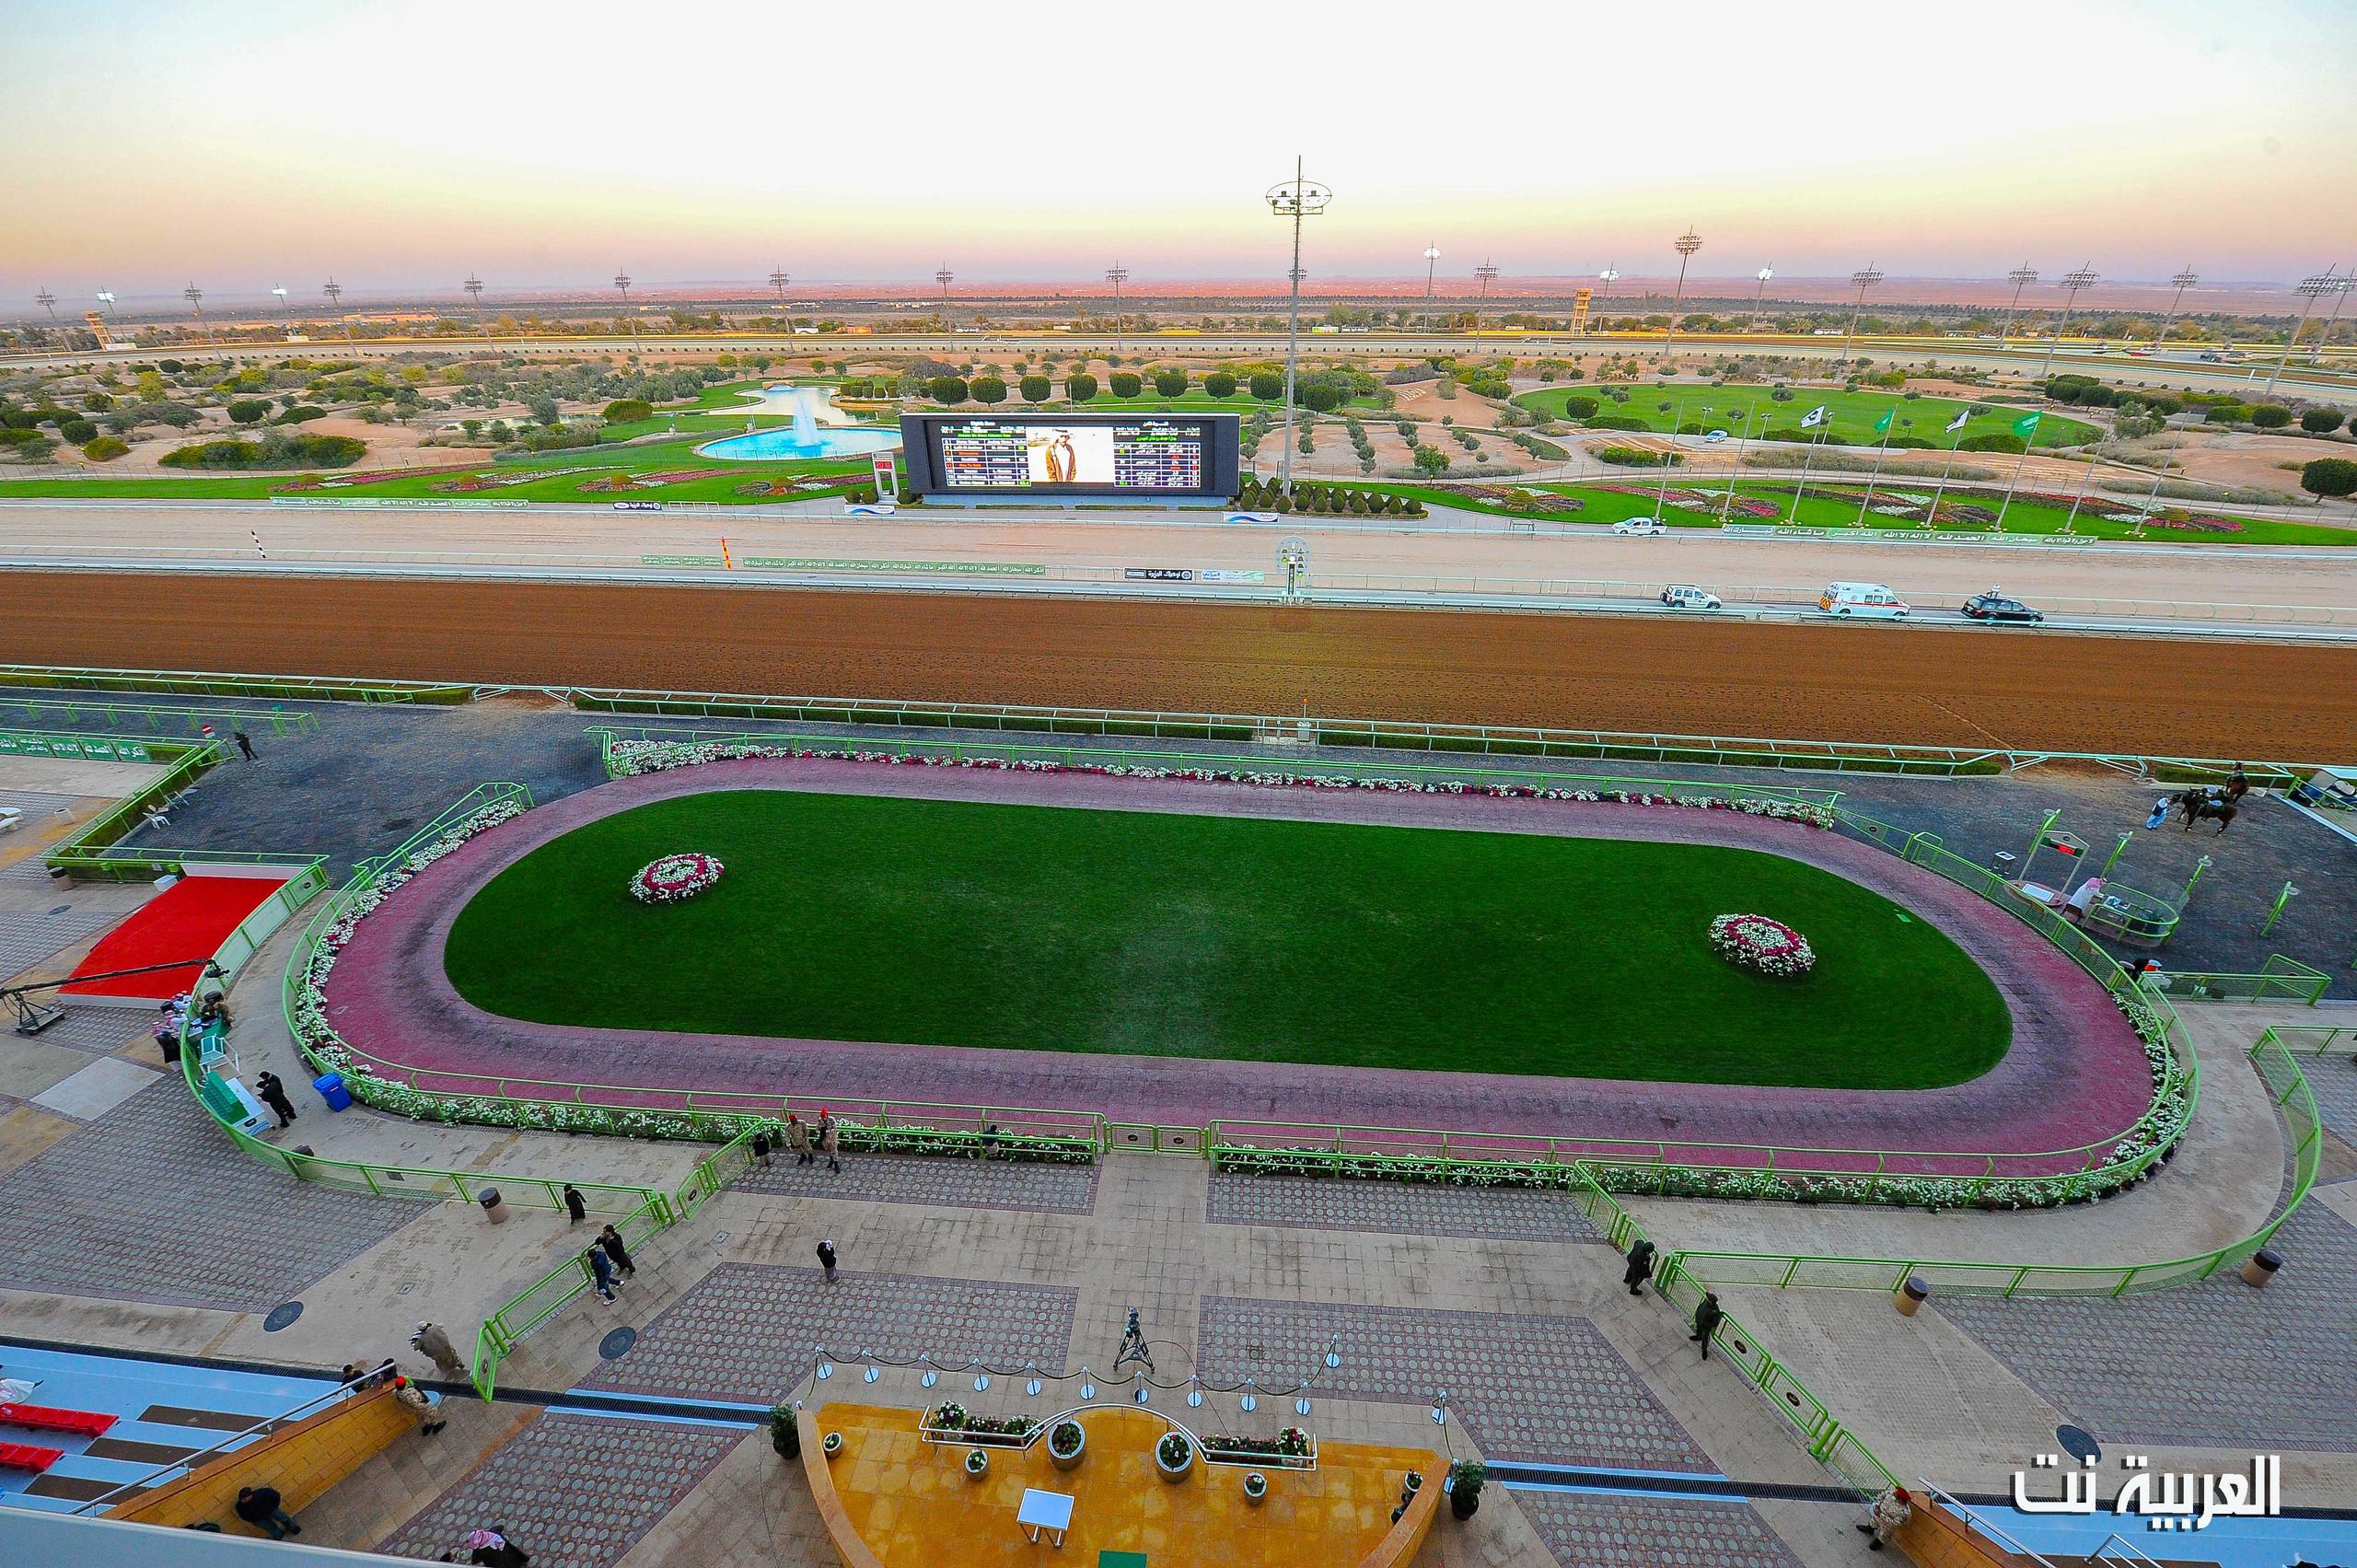 Equestrian Park - King Abdul Aziz Equestrian Square